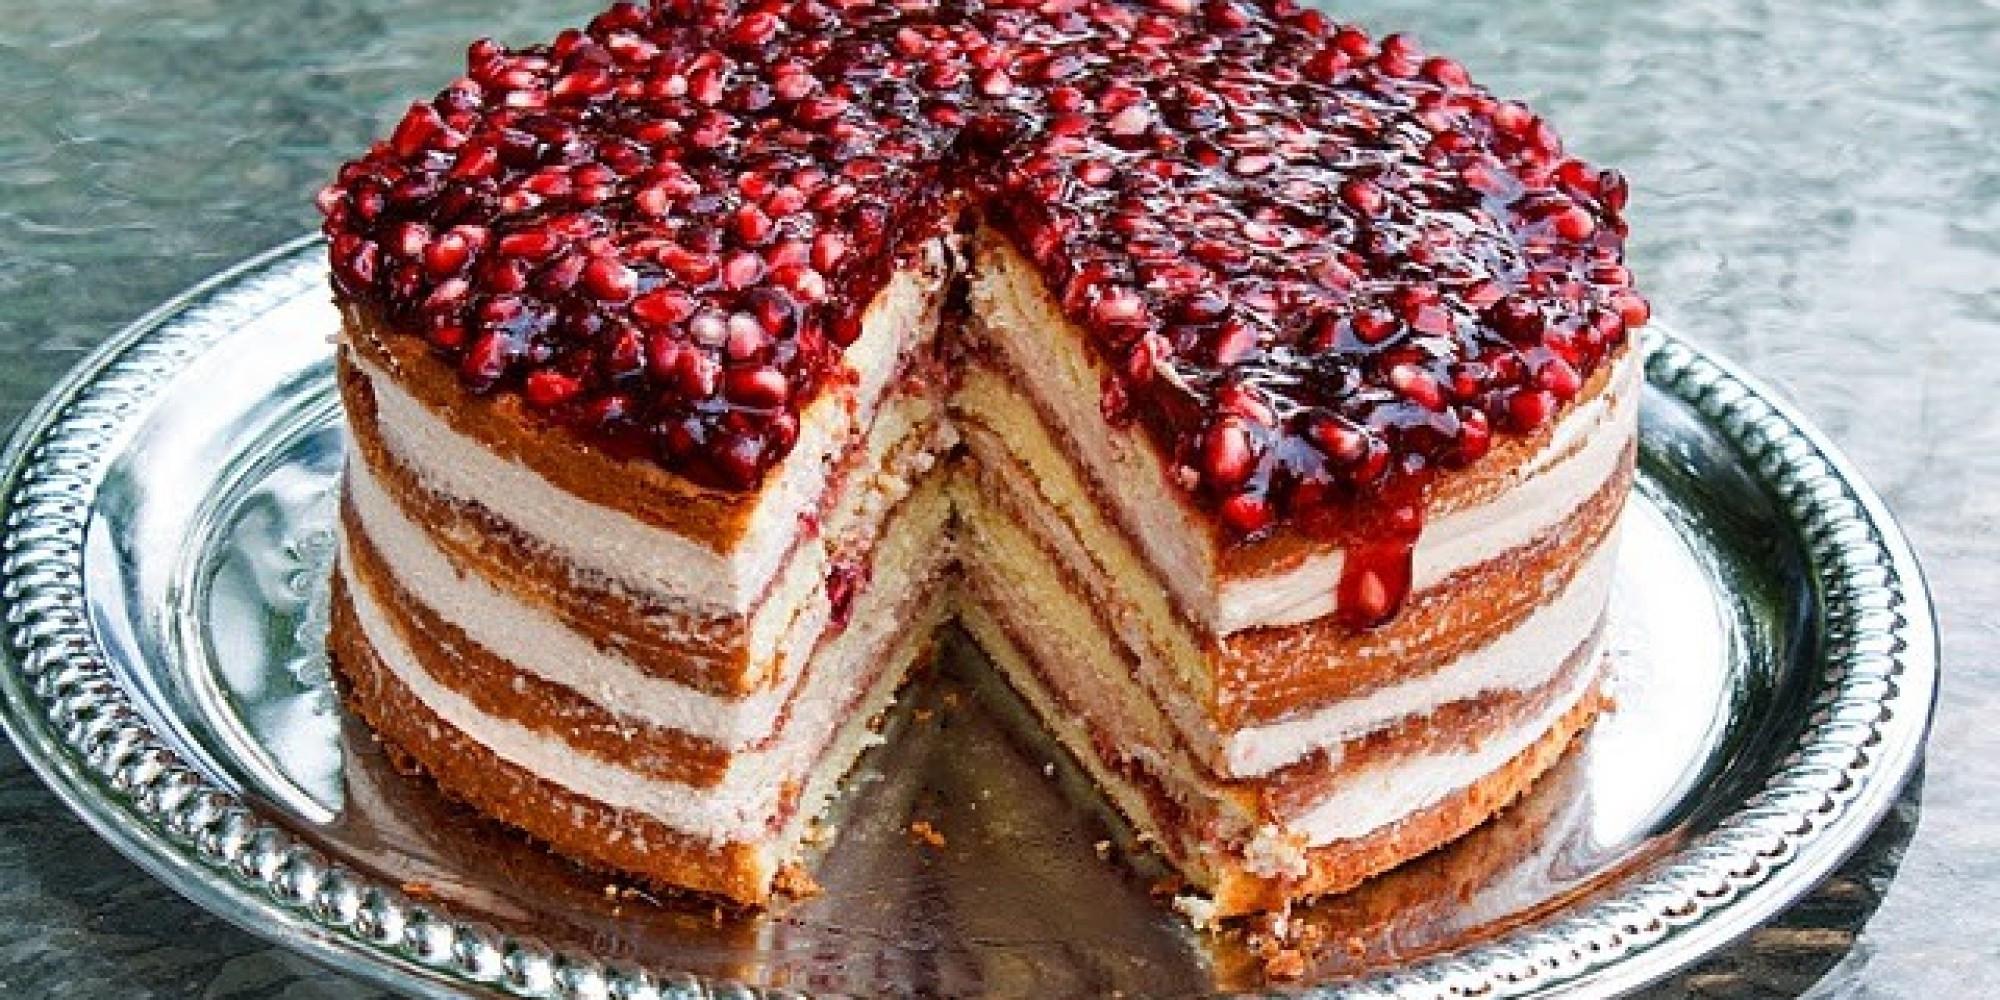 Most Popular Christmas Desserts  The Most Stunning Christmas Dessert Recipes Ever PHOTOS